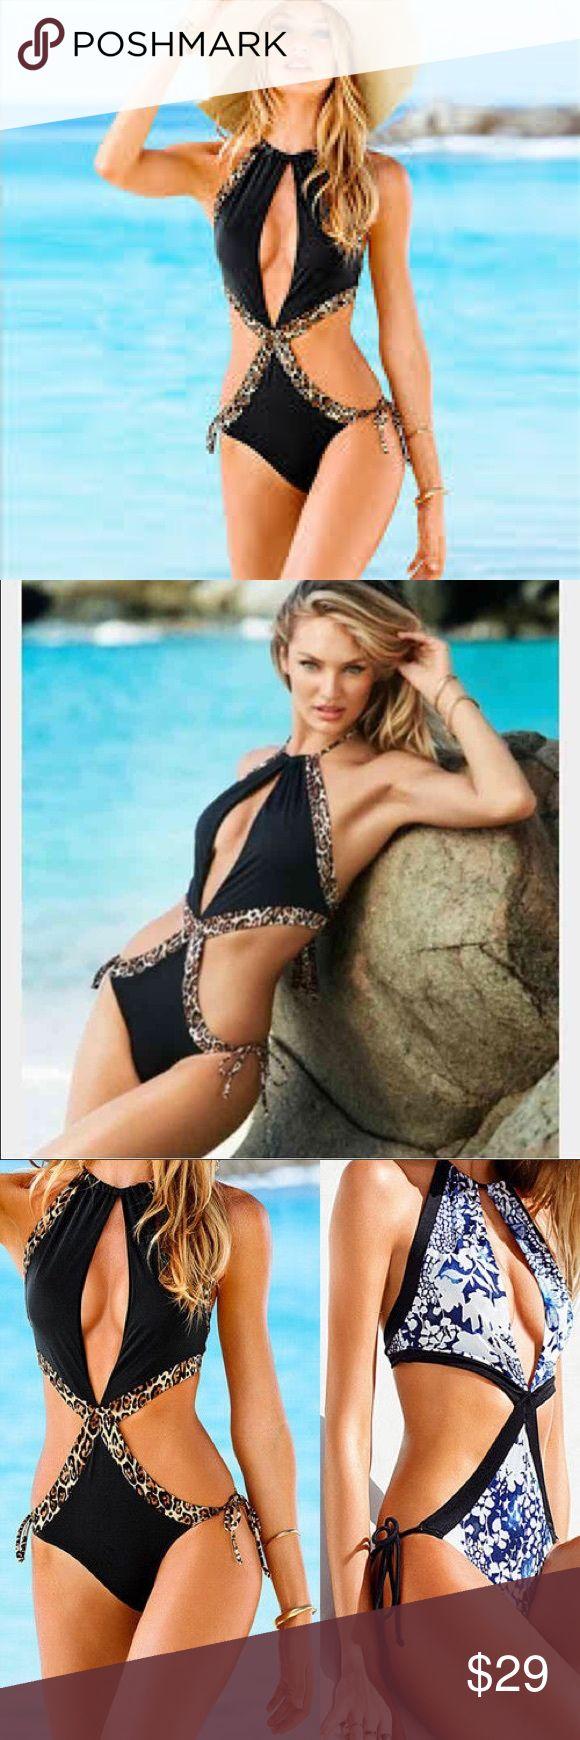 Victoria's Secret leopard print monokini Victoria's Secret leopard print monokini never worn sz medium Victoria's Secret Swim Bikinis